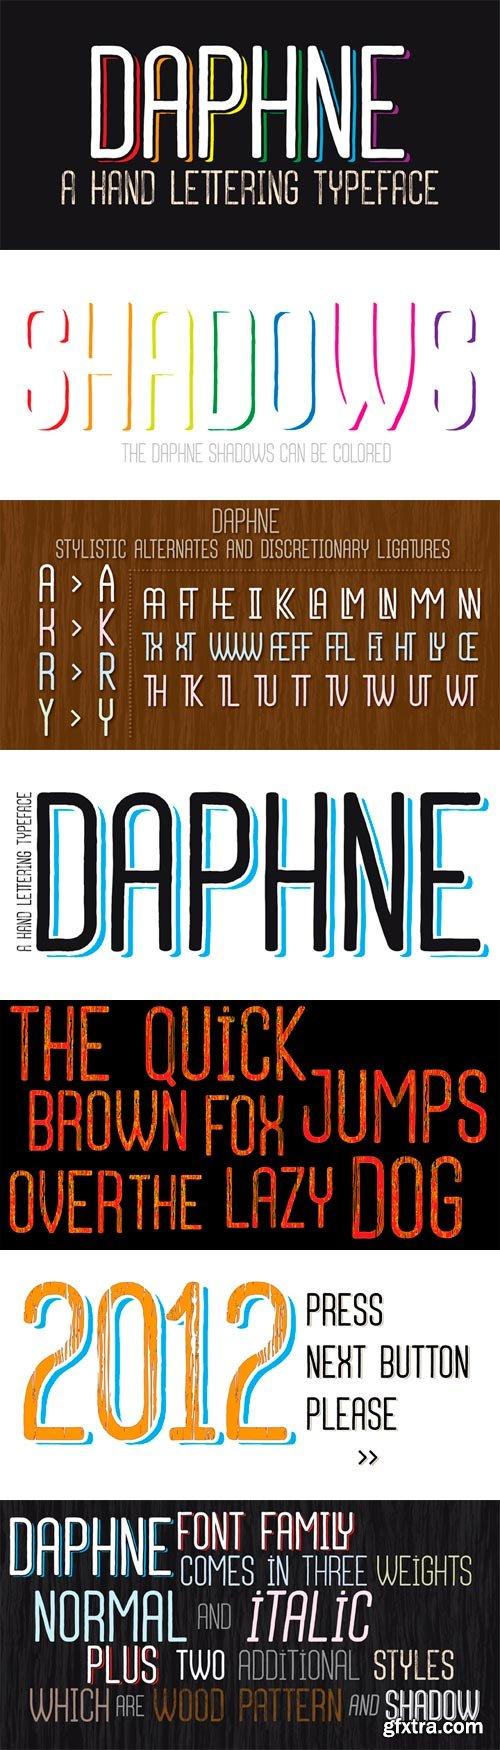 Daphne Font Family - 12 Fonts for $100